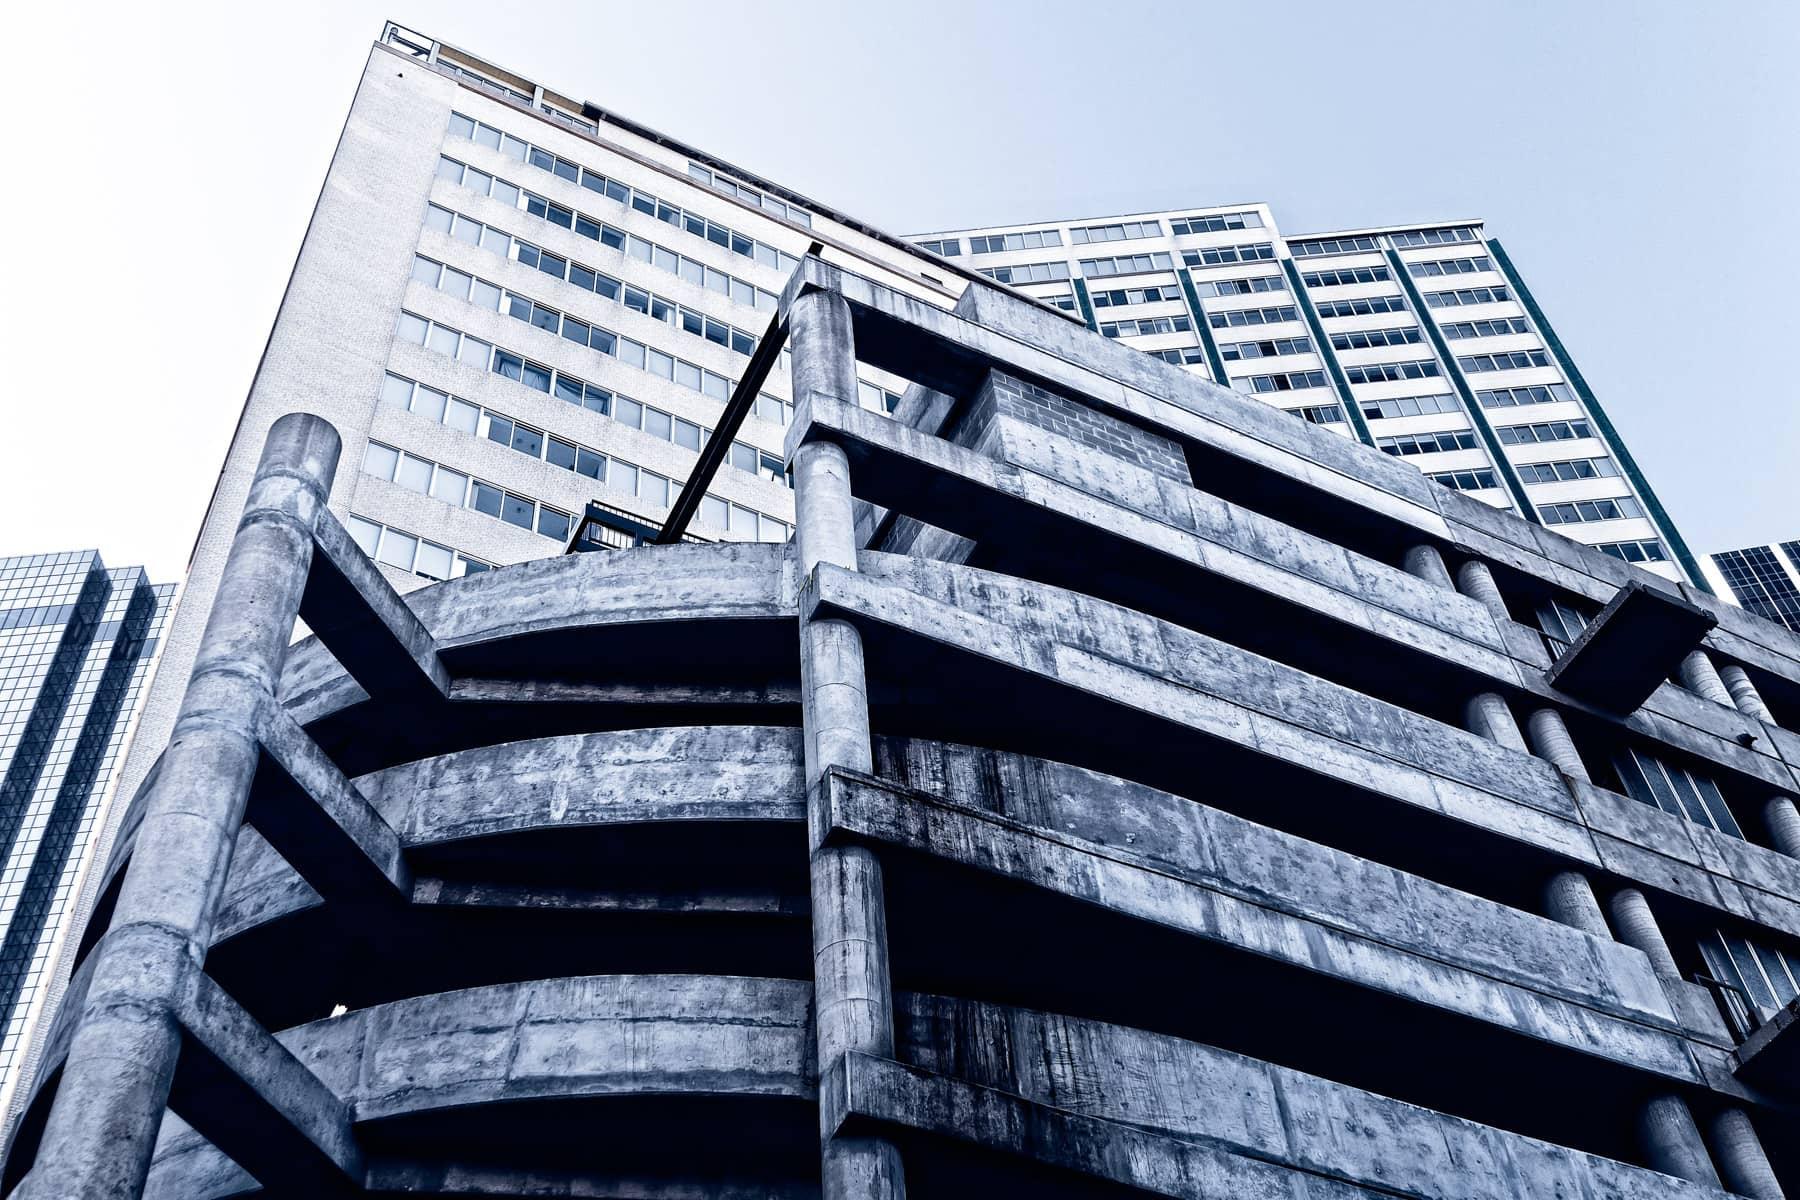 Downtown Garage  DallasFort Worth  75CentralPhotography